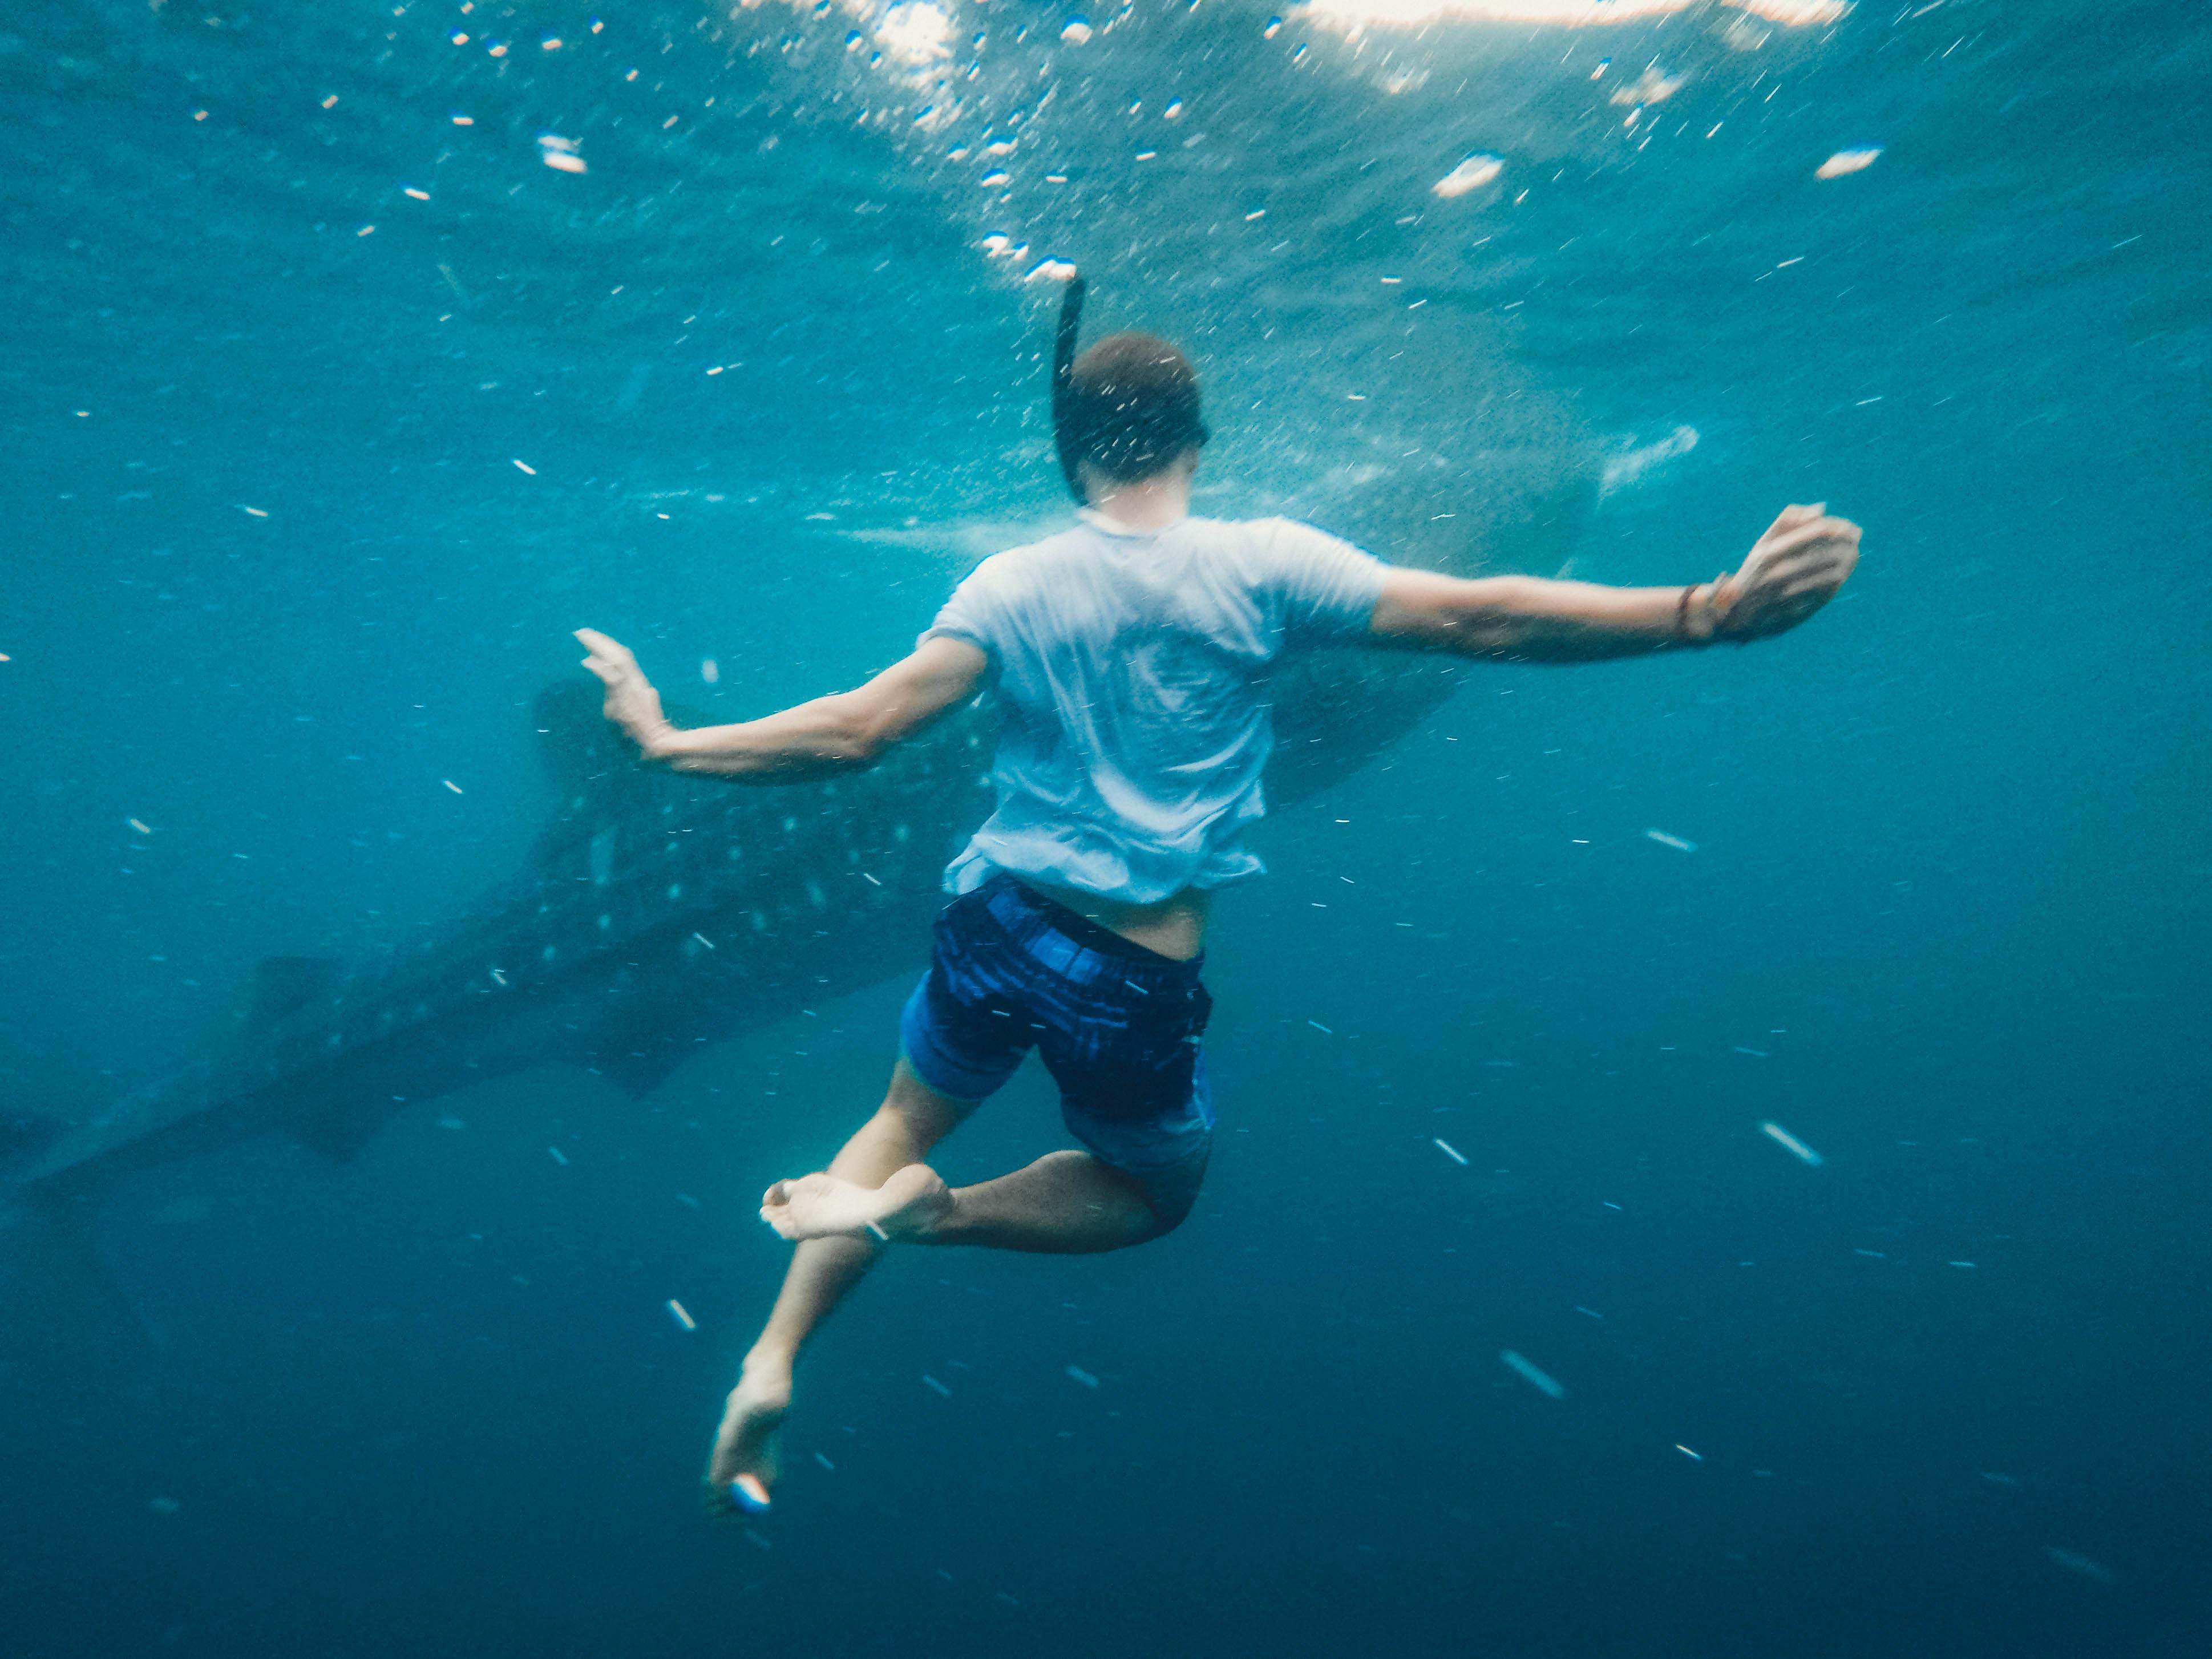 Enjoy swimming with Shark